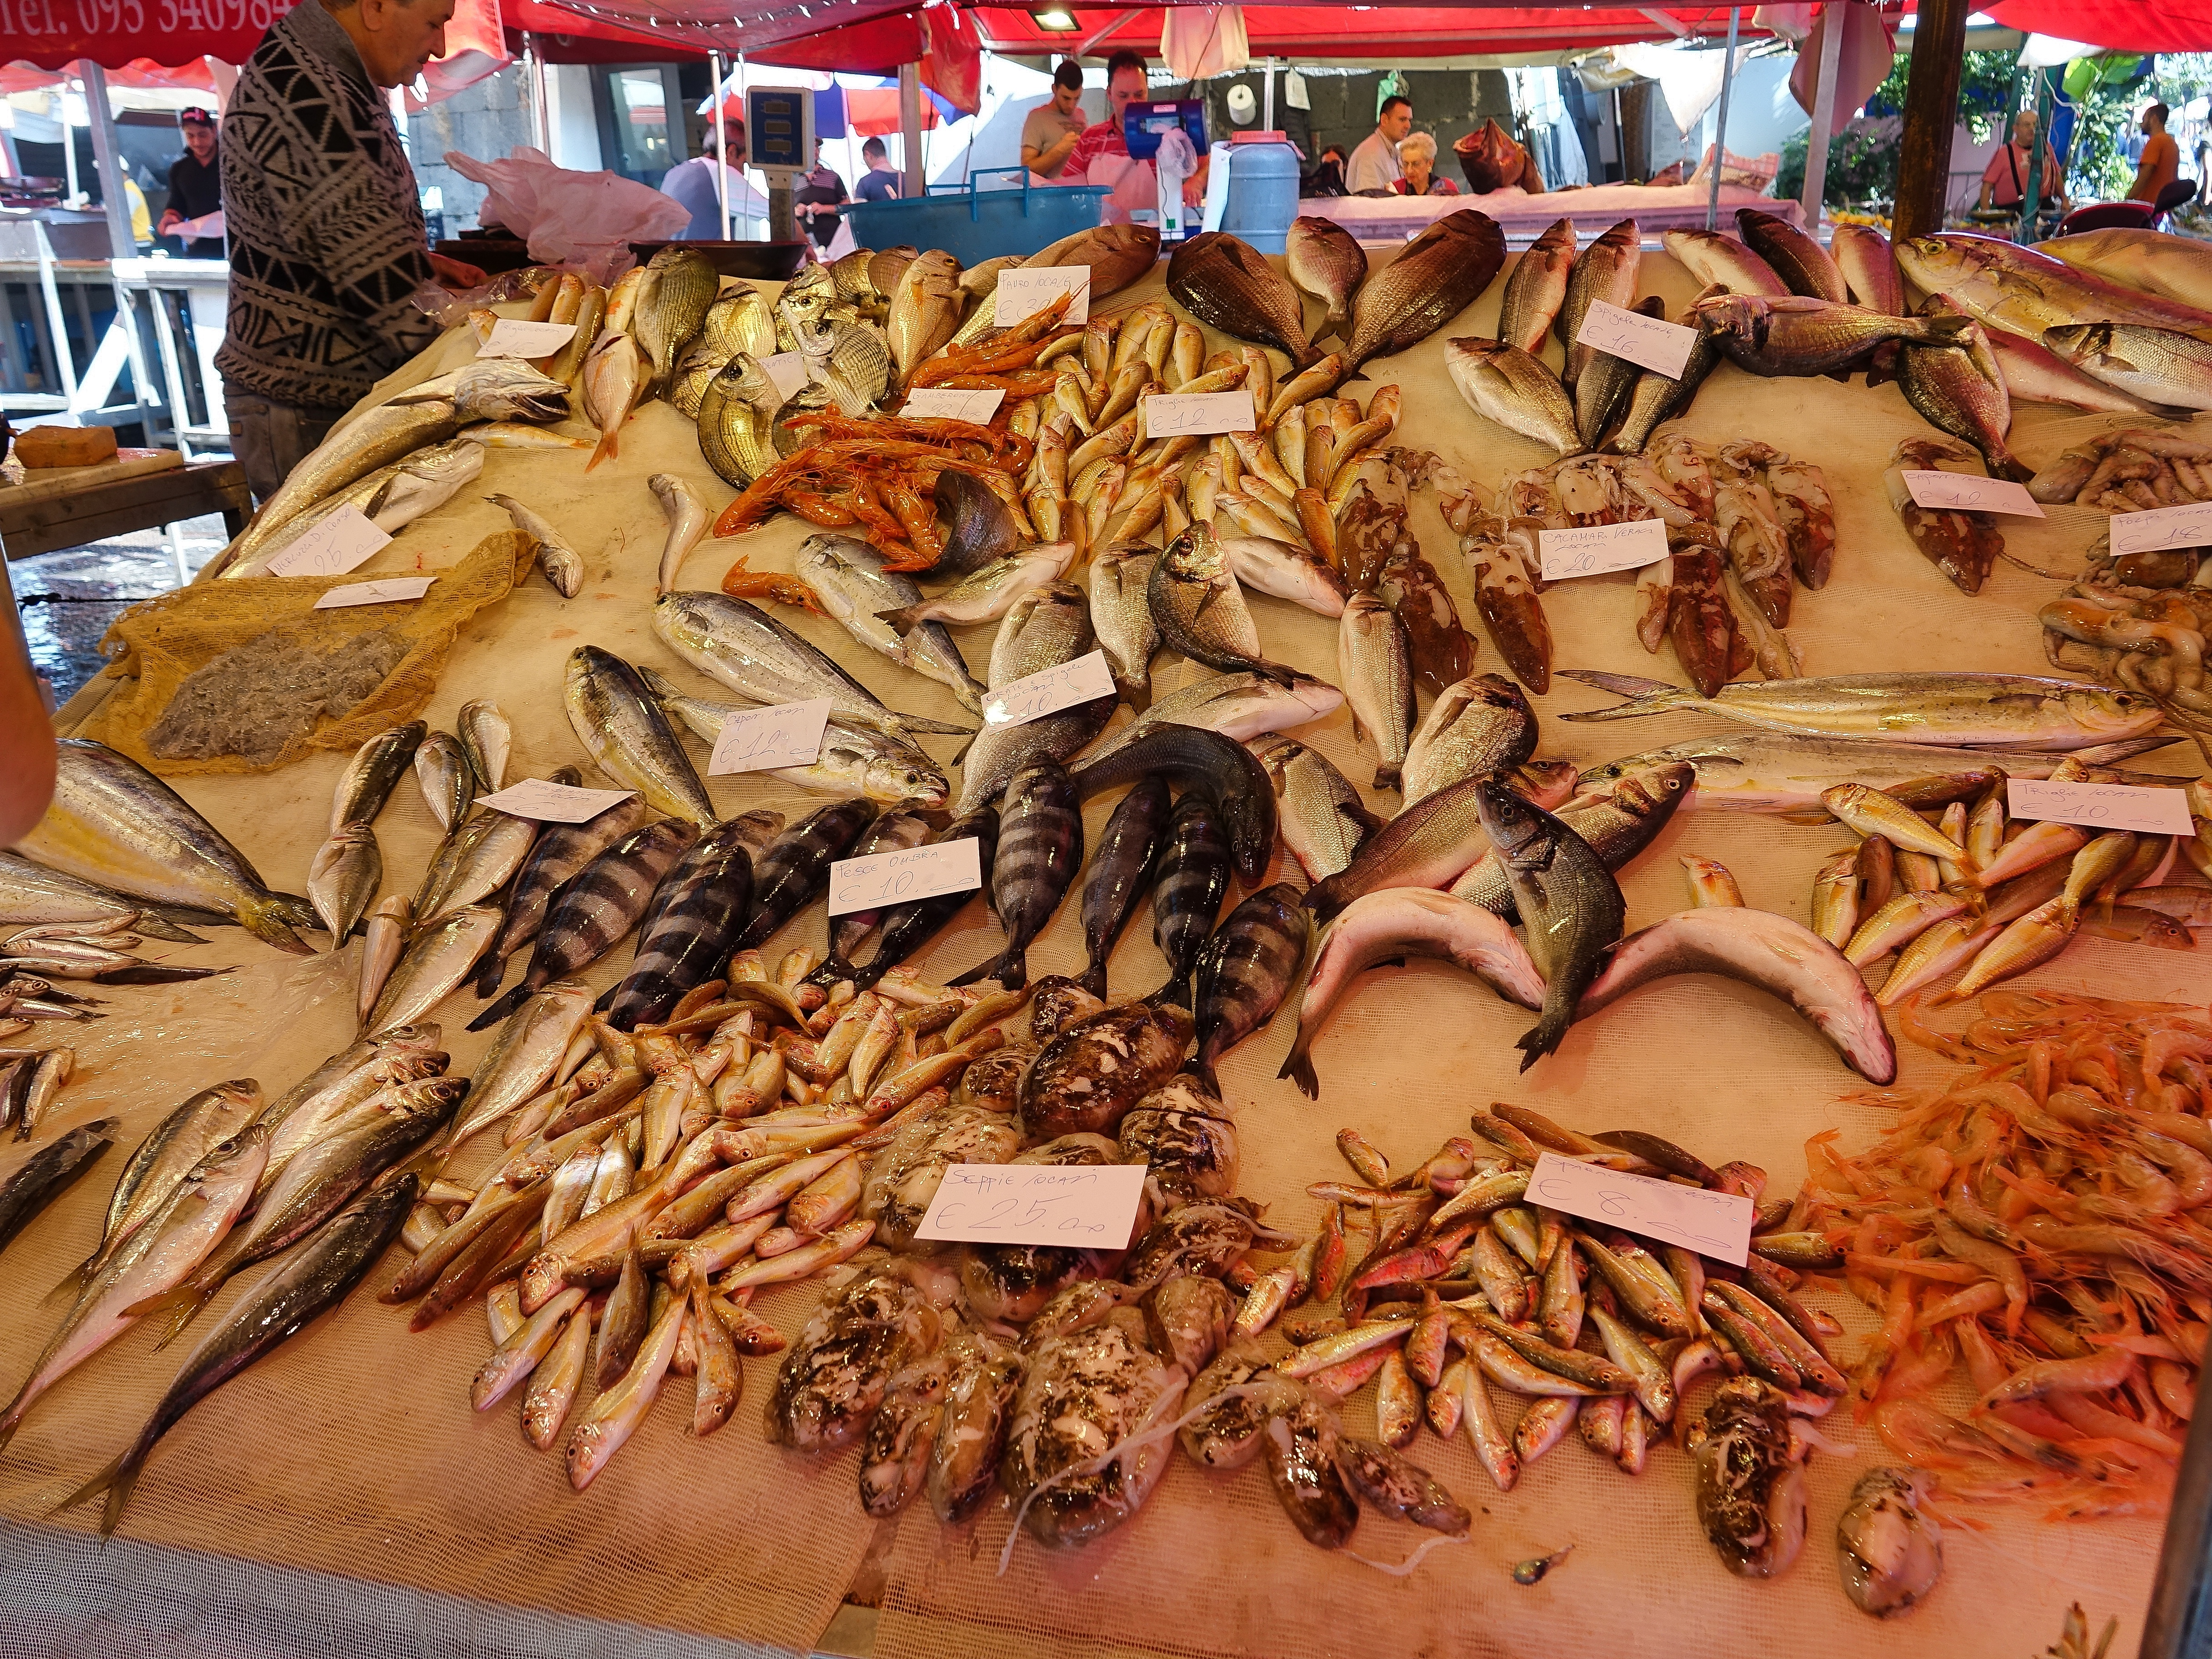 Feast of fresh seafood